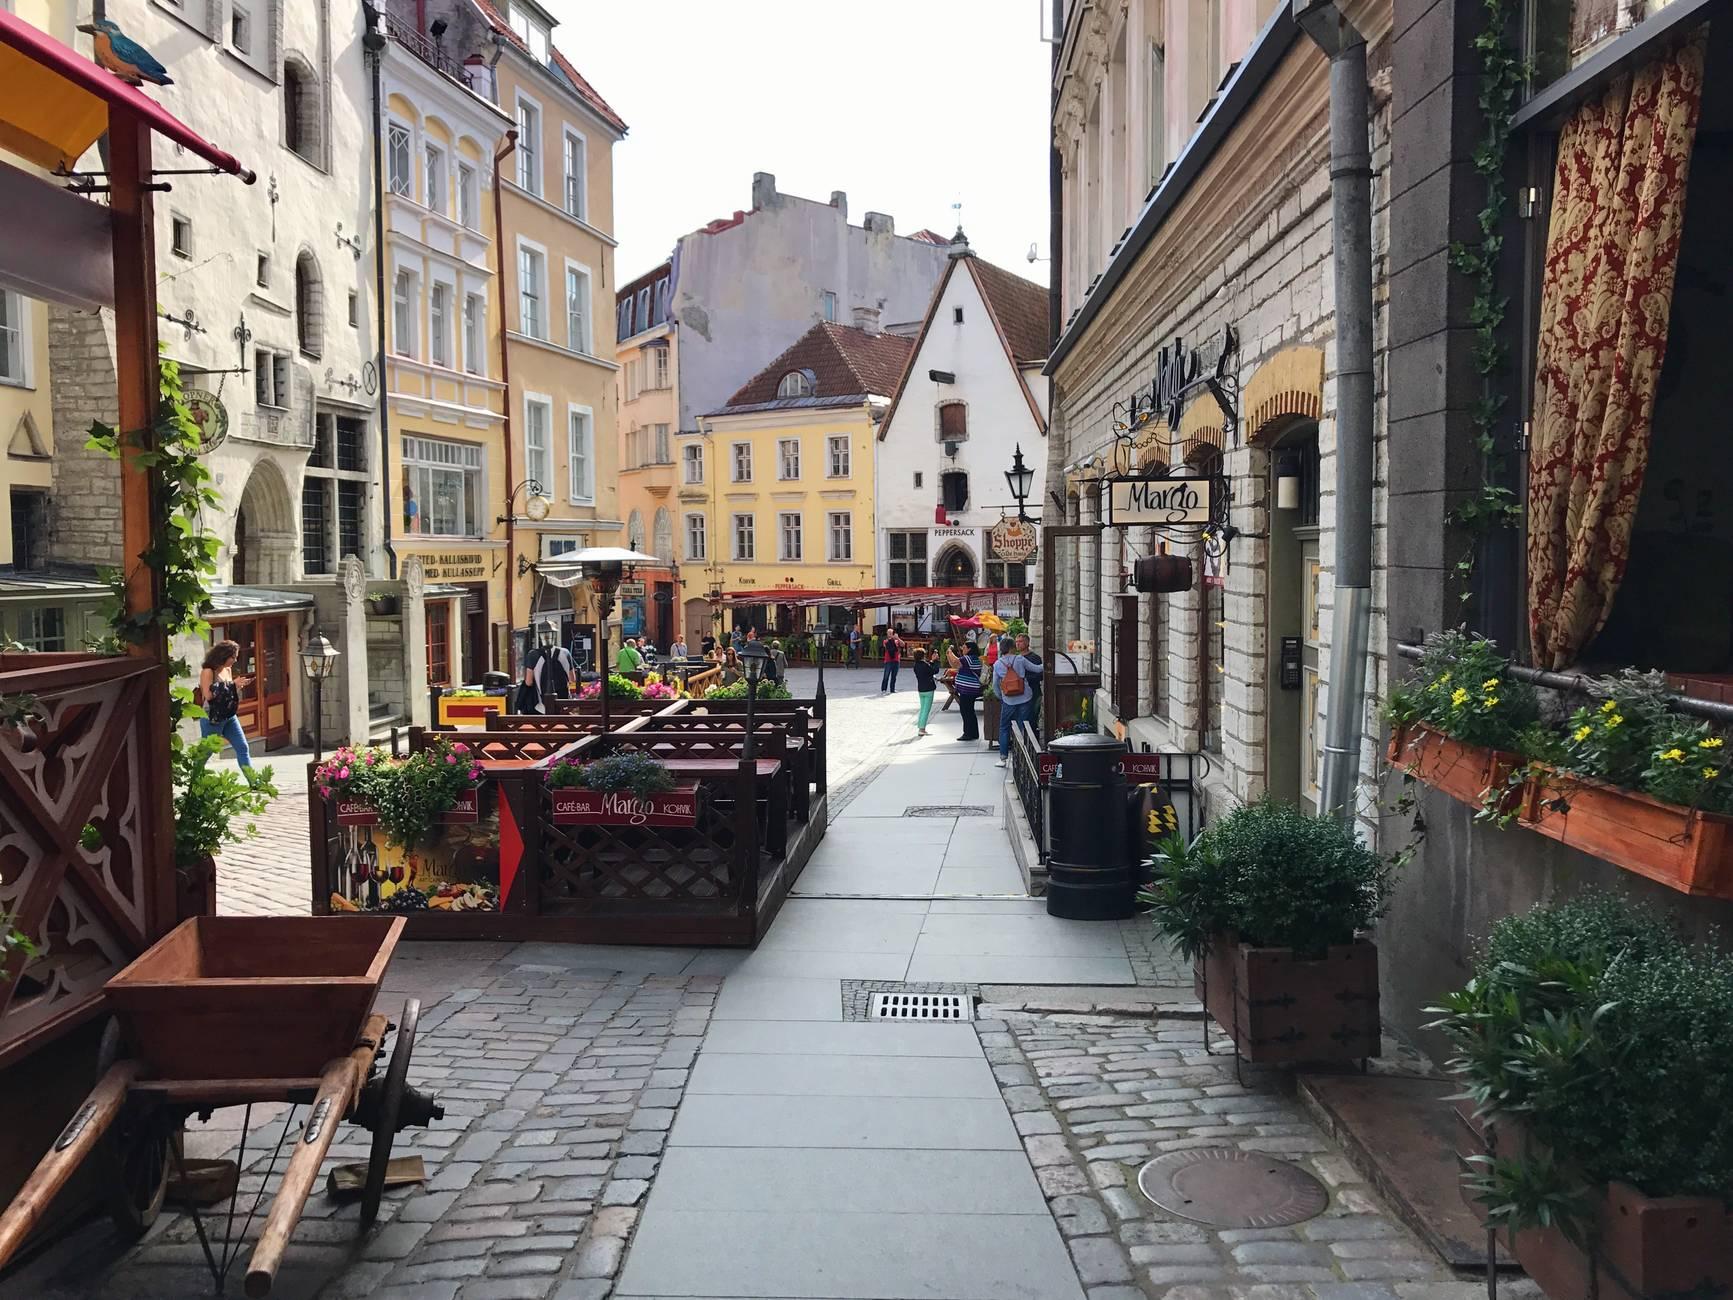 Medieval street in the Old Town of Tallinn, Estonia